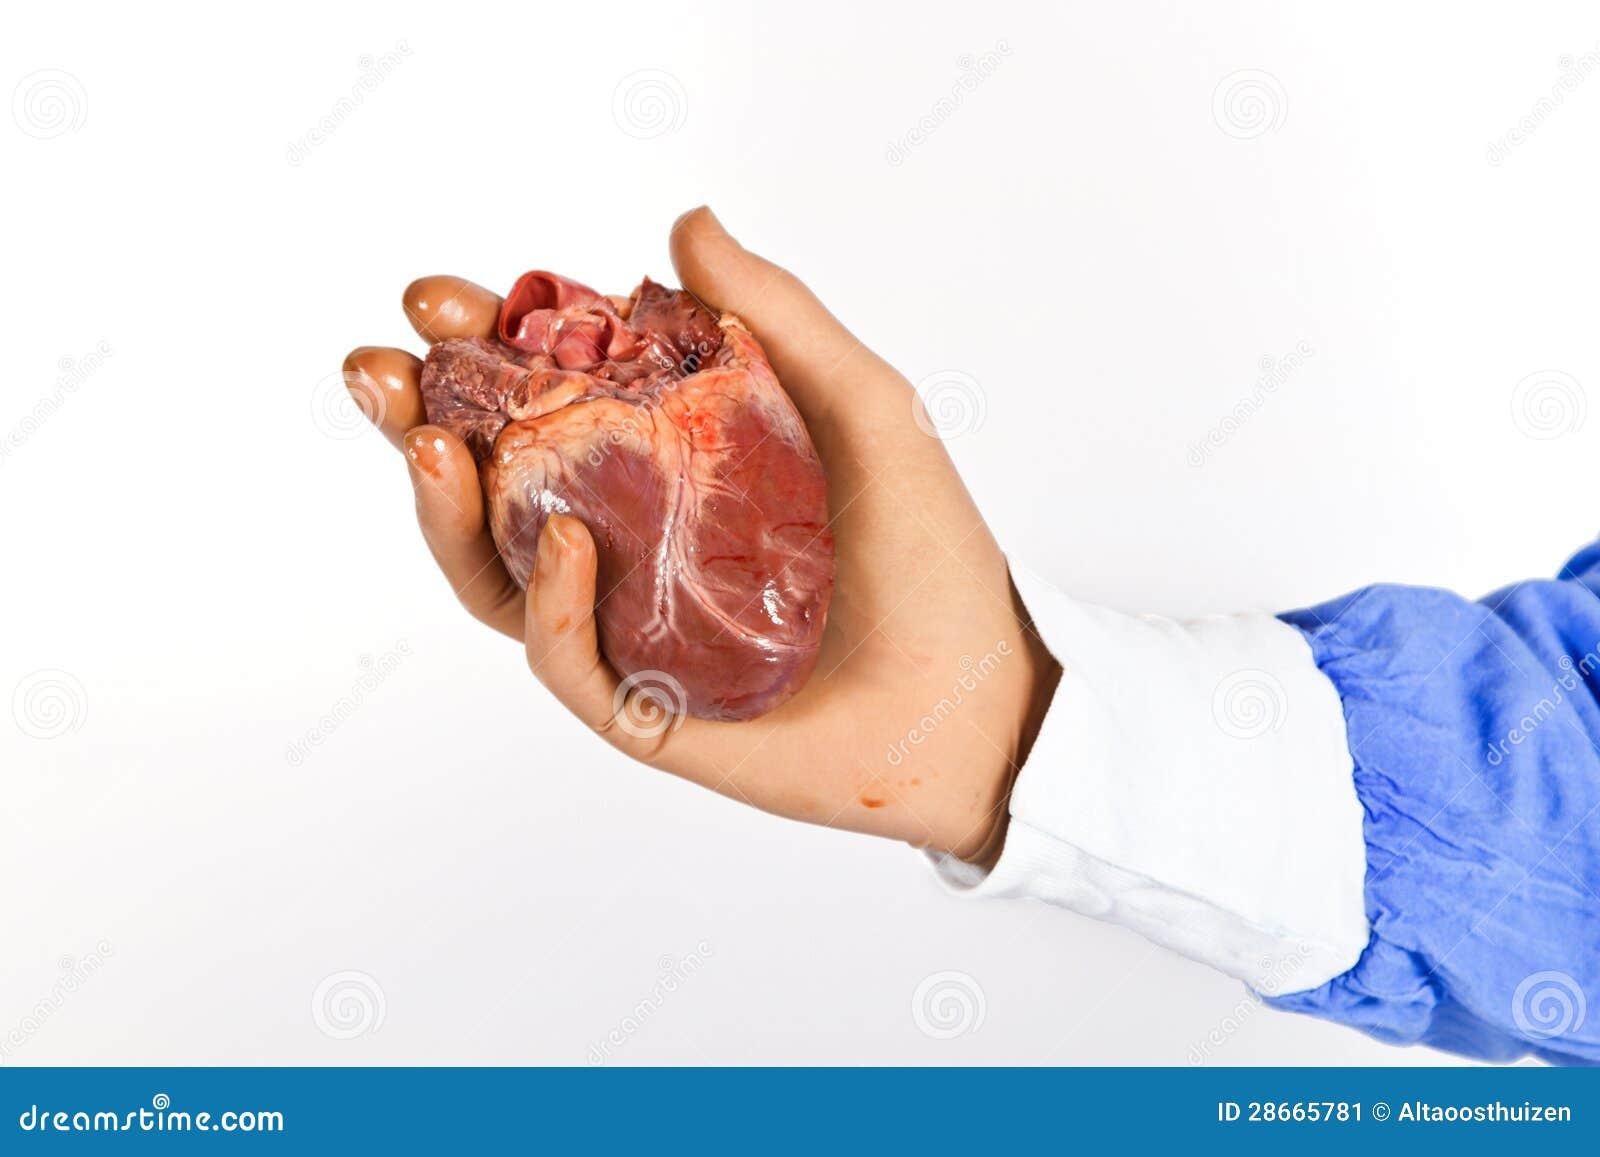 cardiac surgeon holding a heart stock image - image: 28665781, Cephalic Vein